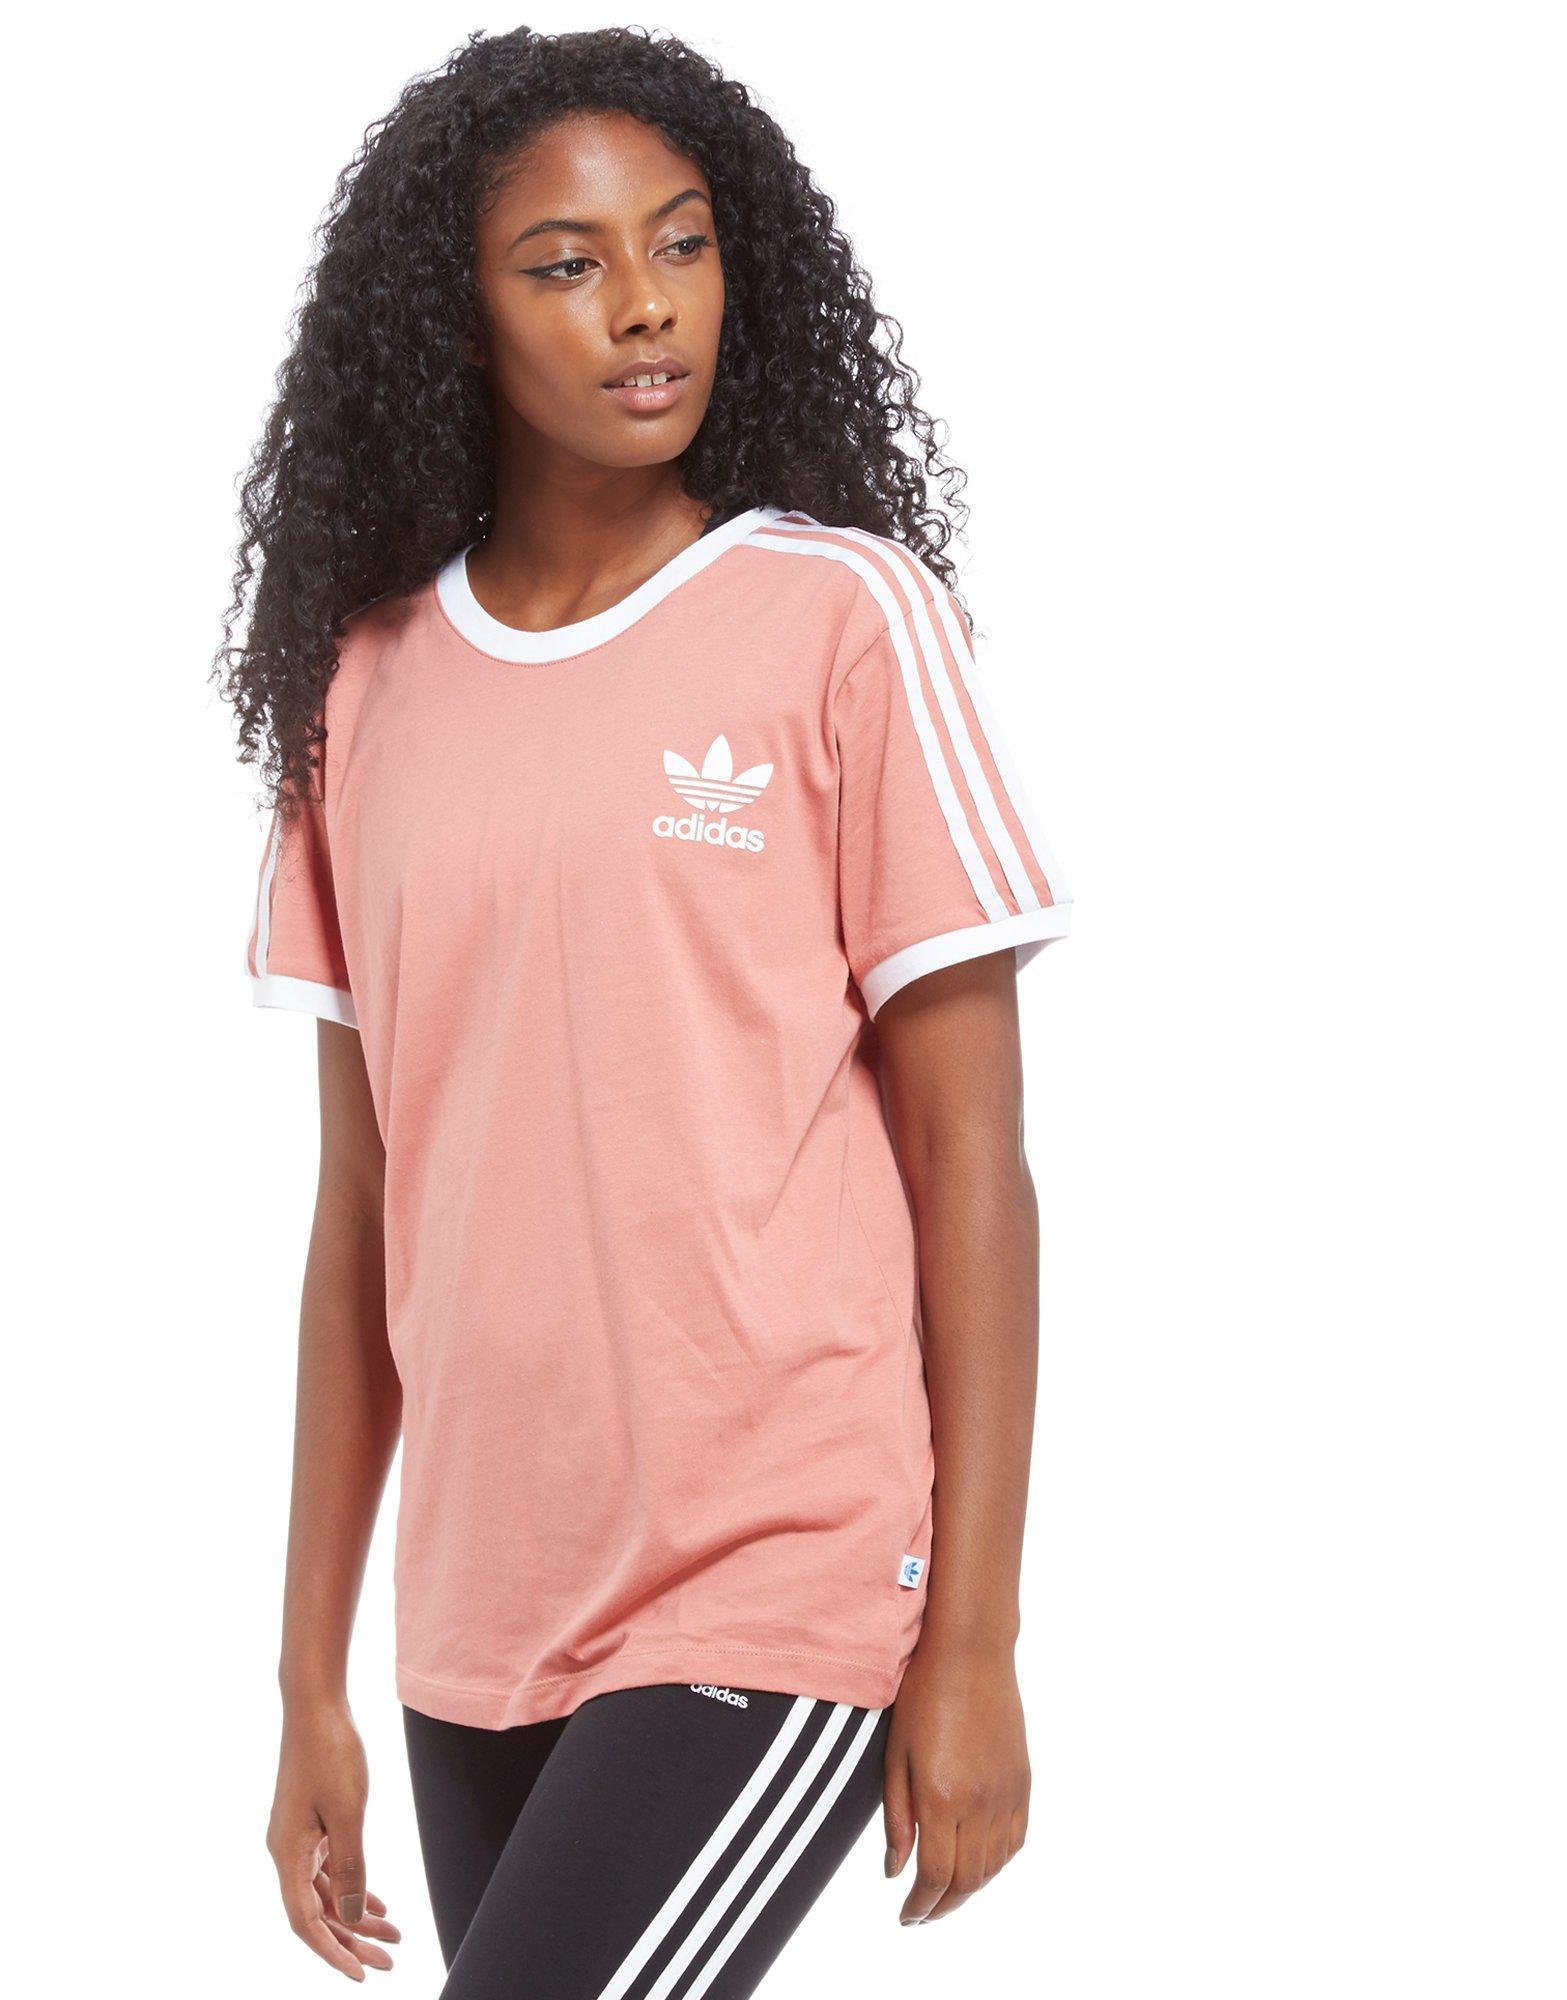 adidas shirt jd sports